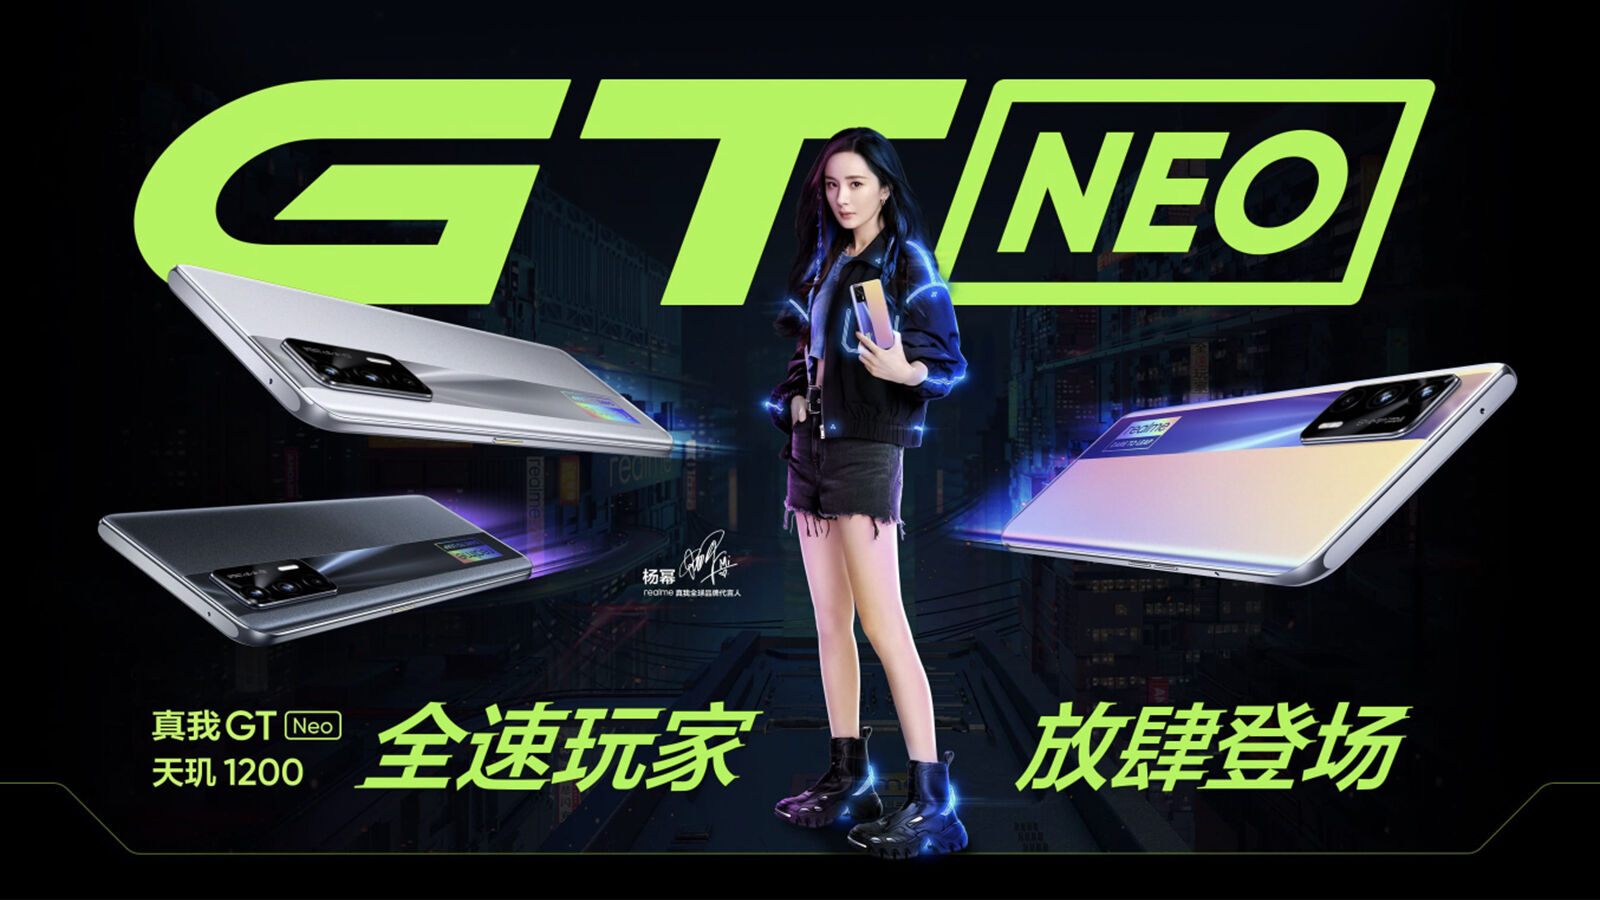 Realme GT Neo press image